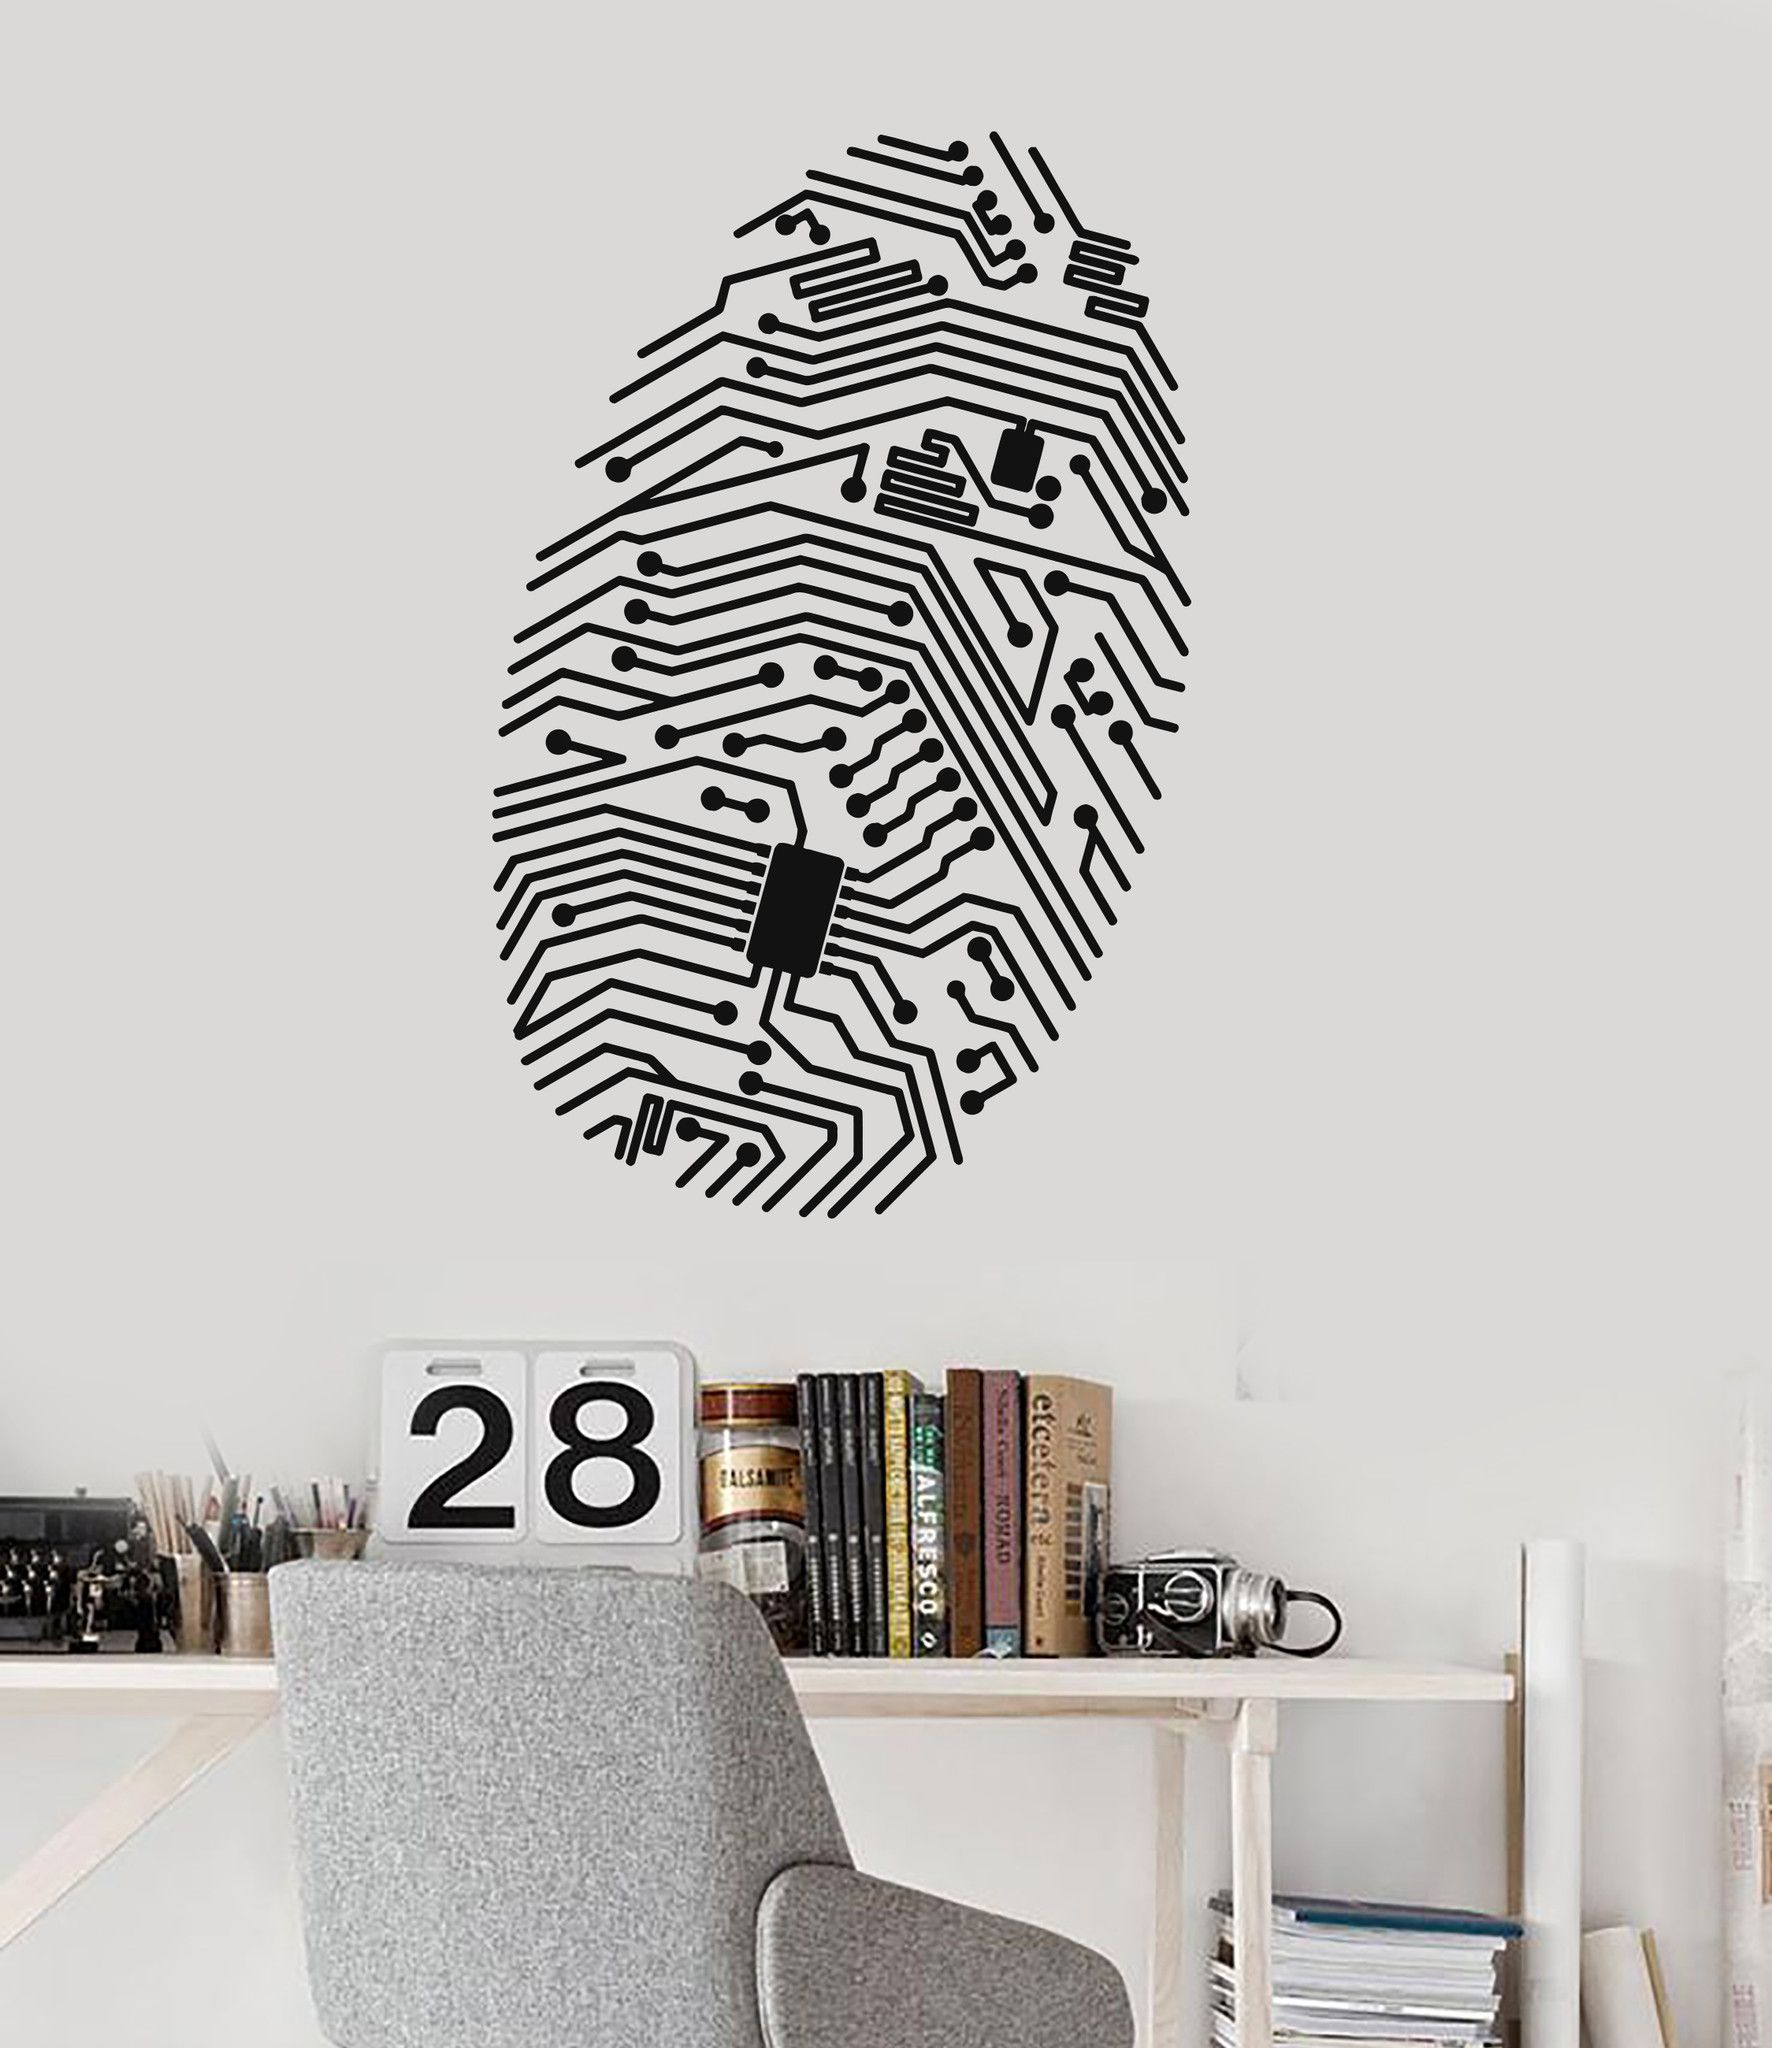 Vinyl wall decal fingerprint chip computer geek security it vinyl wall decal fingerprint chip computer geek security it stickers unique gift 086ig amipublicfo Choice Image